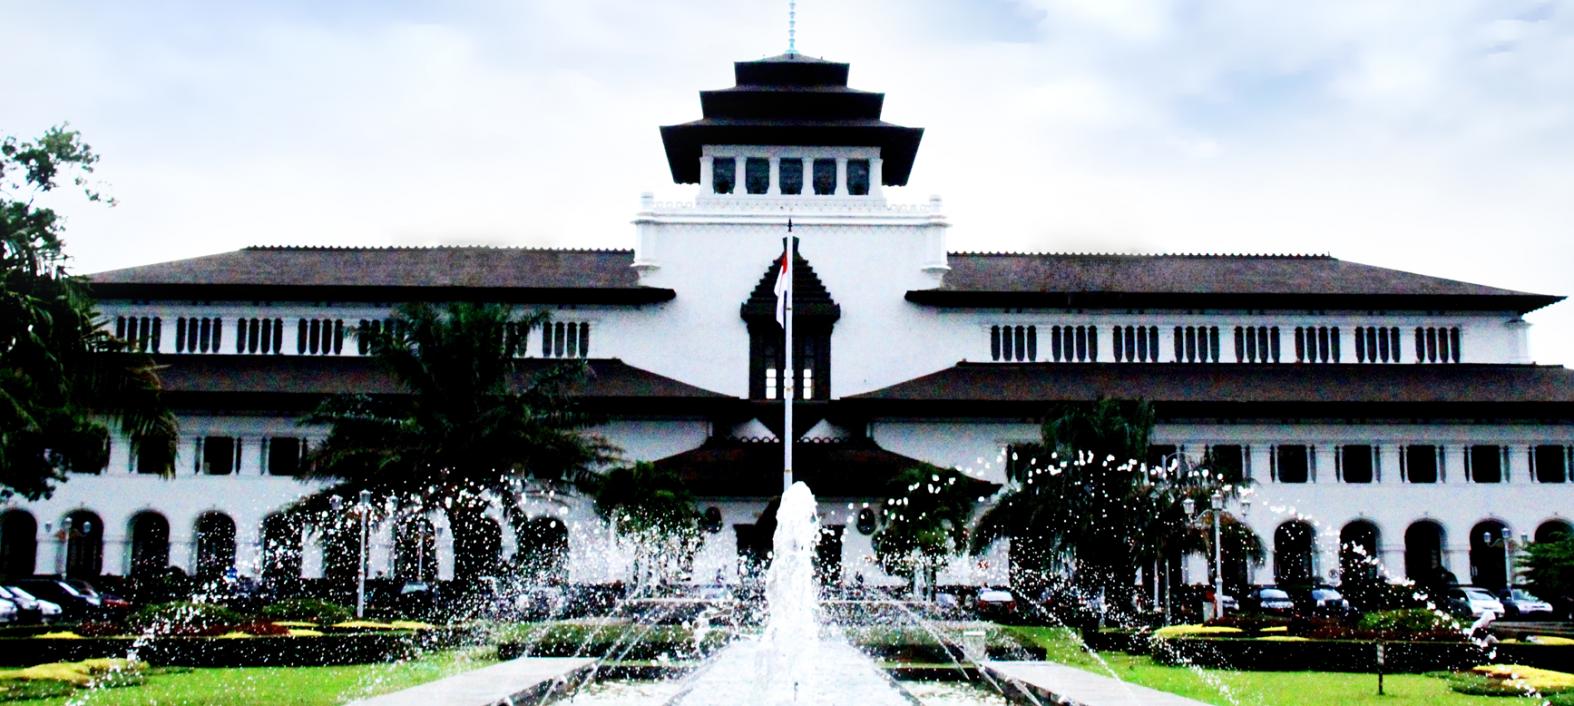 Gedung Sate Sma Bina Negara 1 Baleendah Bandung Kab